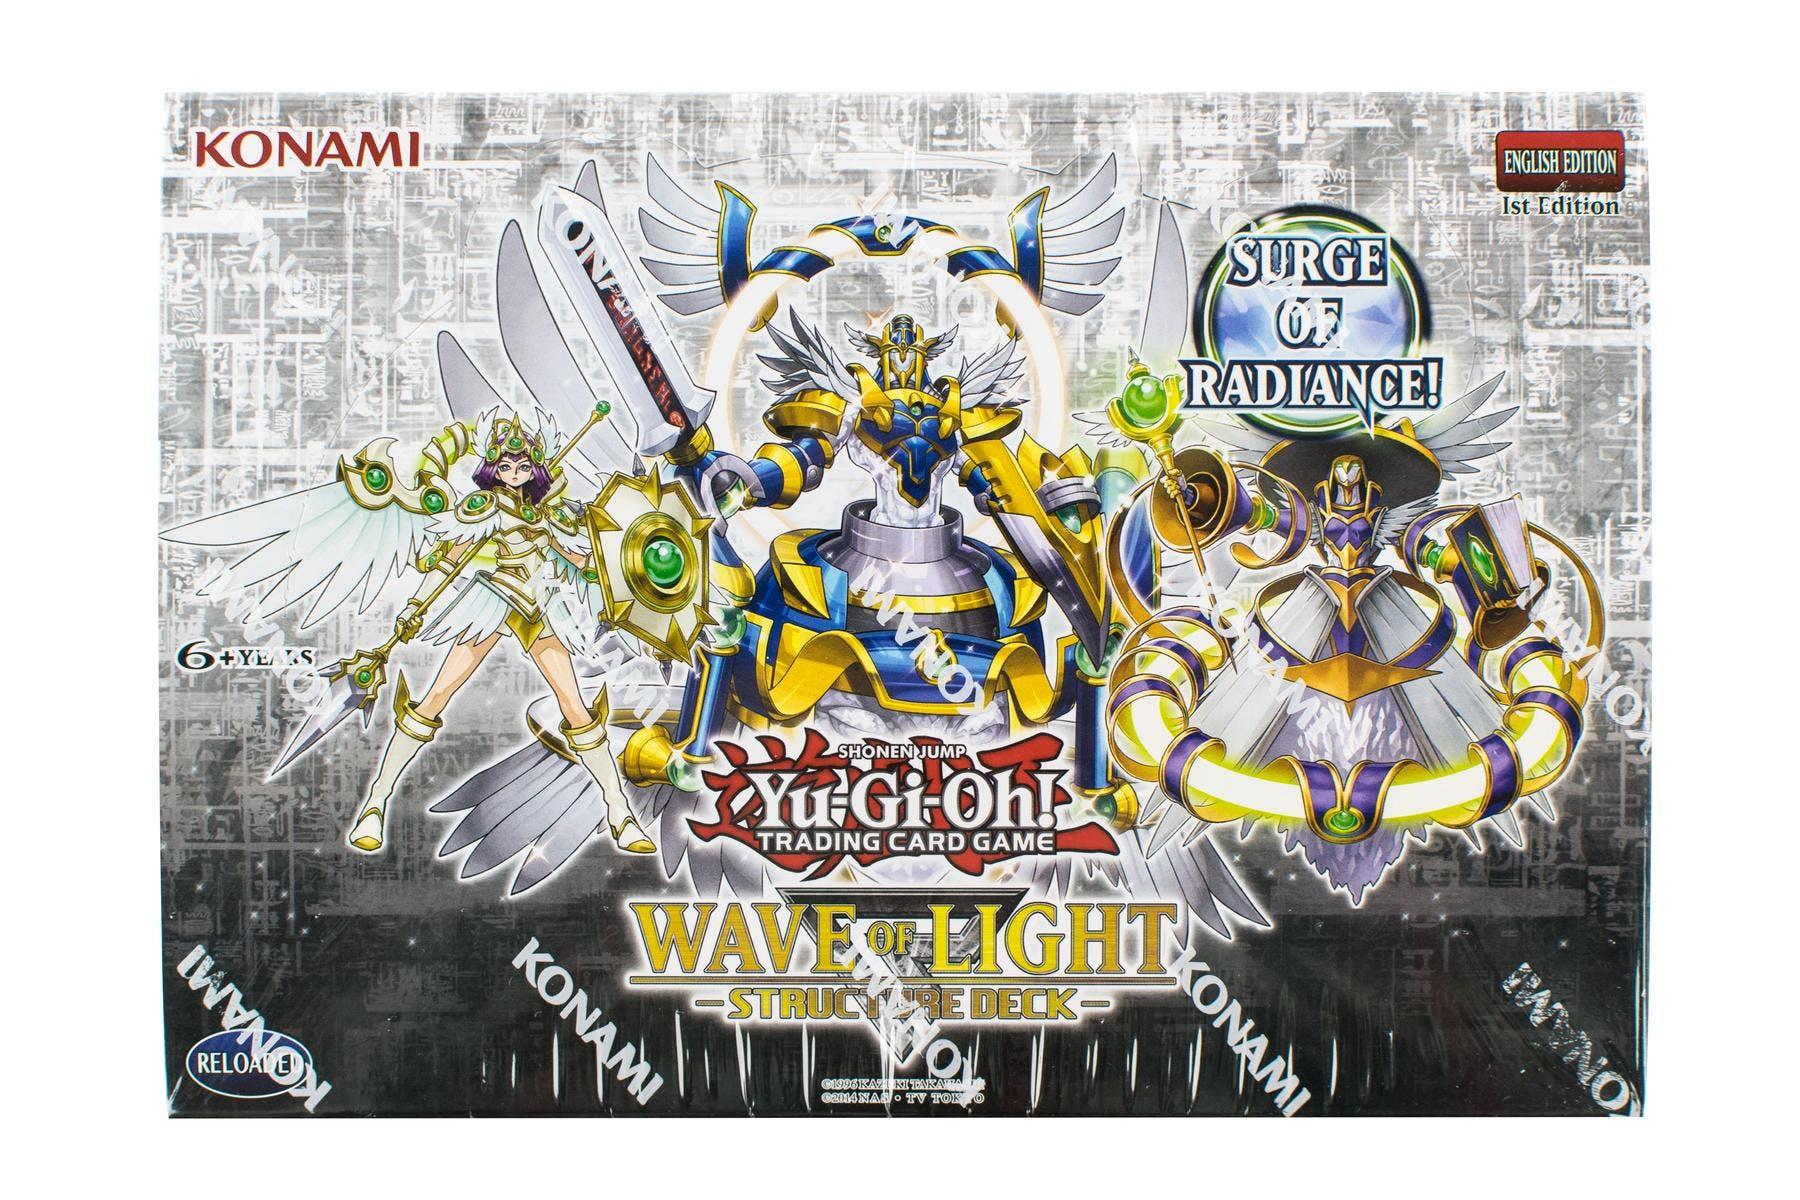 Konami yu gi oh wave of light structure deck box da card world konami yu gi oh wave of light structure deck box mozeypictures Images